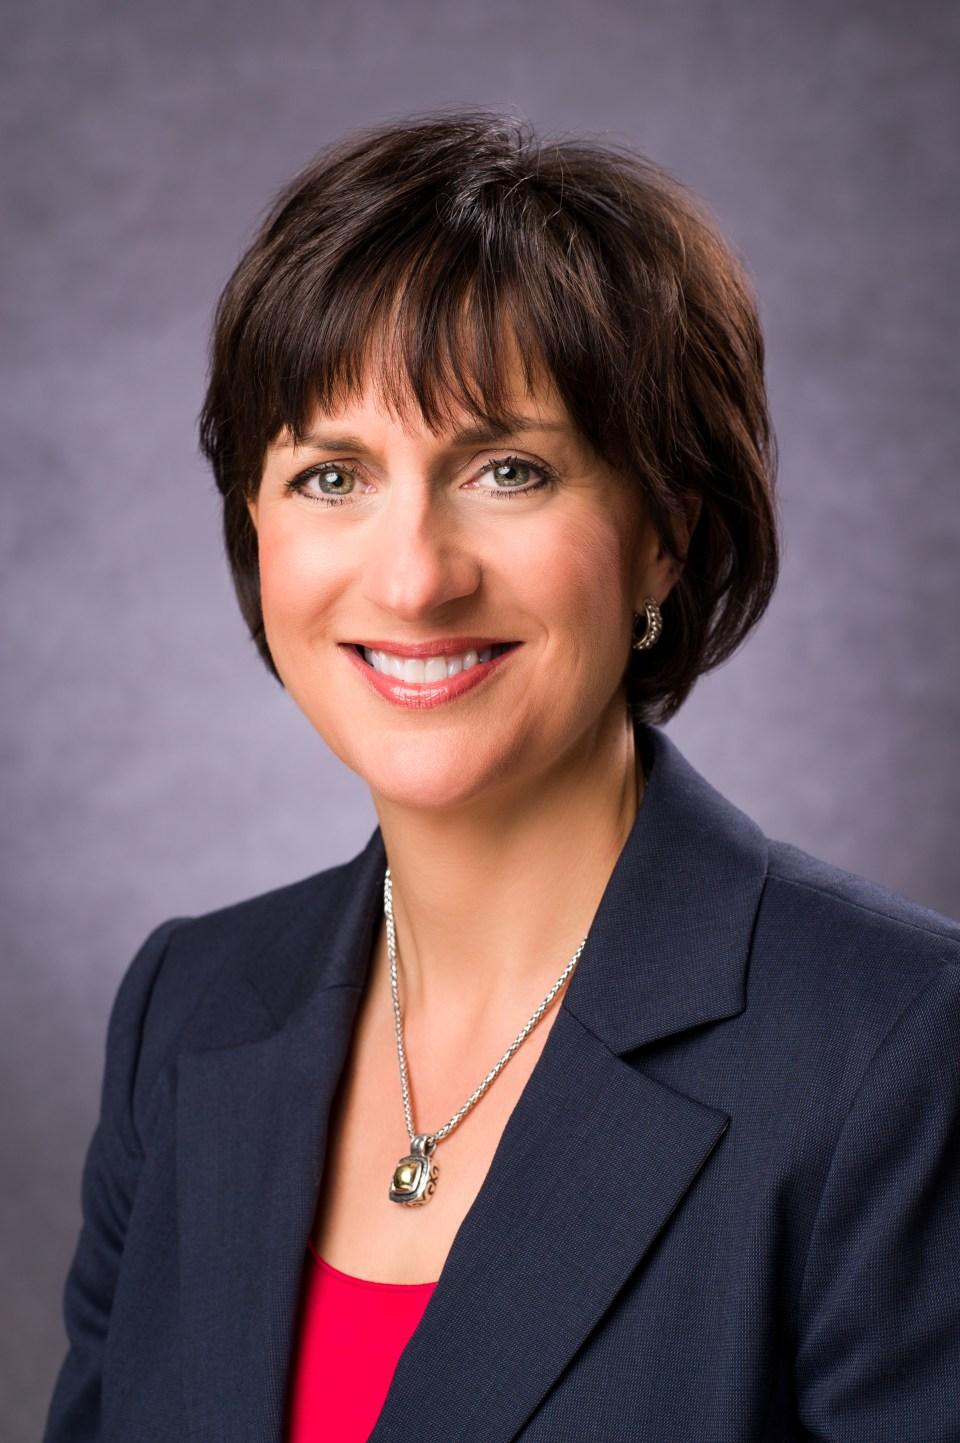 Portrait of Jeanne Allen, President of the Center for Education Reform.